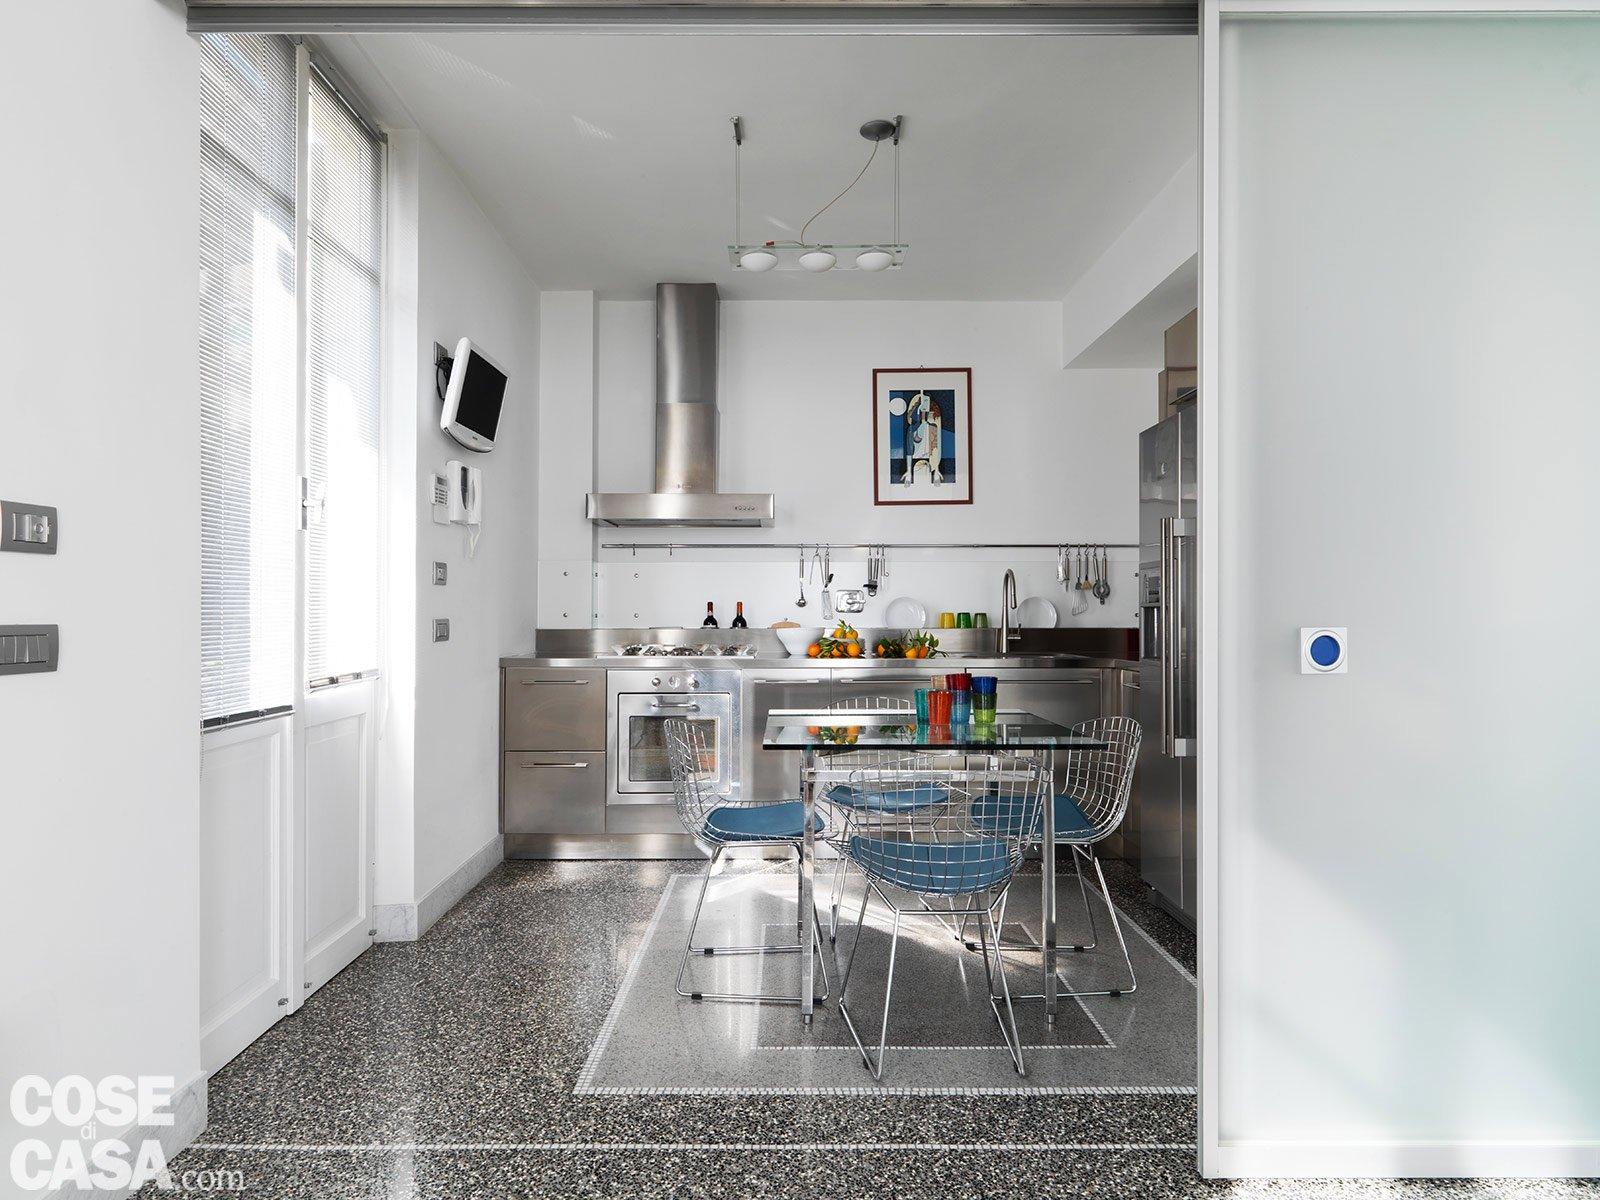 Mattonelle Moderne Per Cucine : Piastrelle moderne per cucine ...